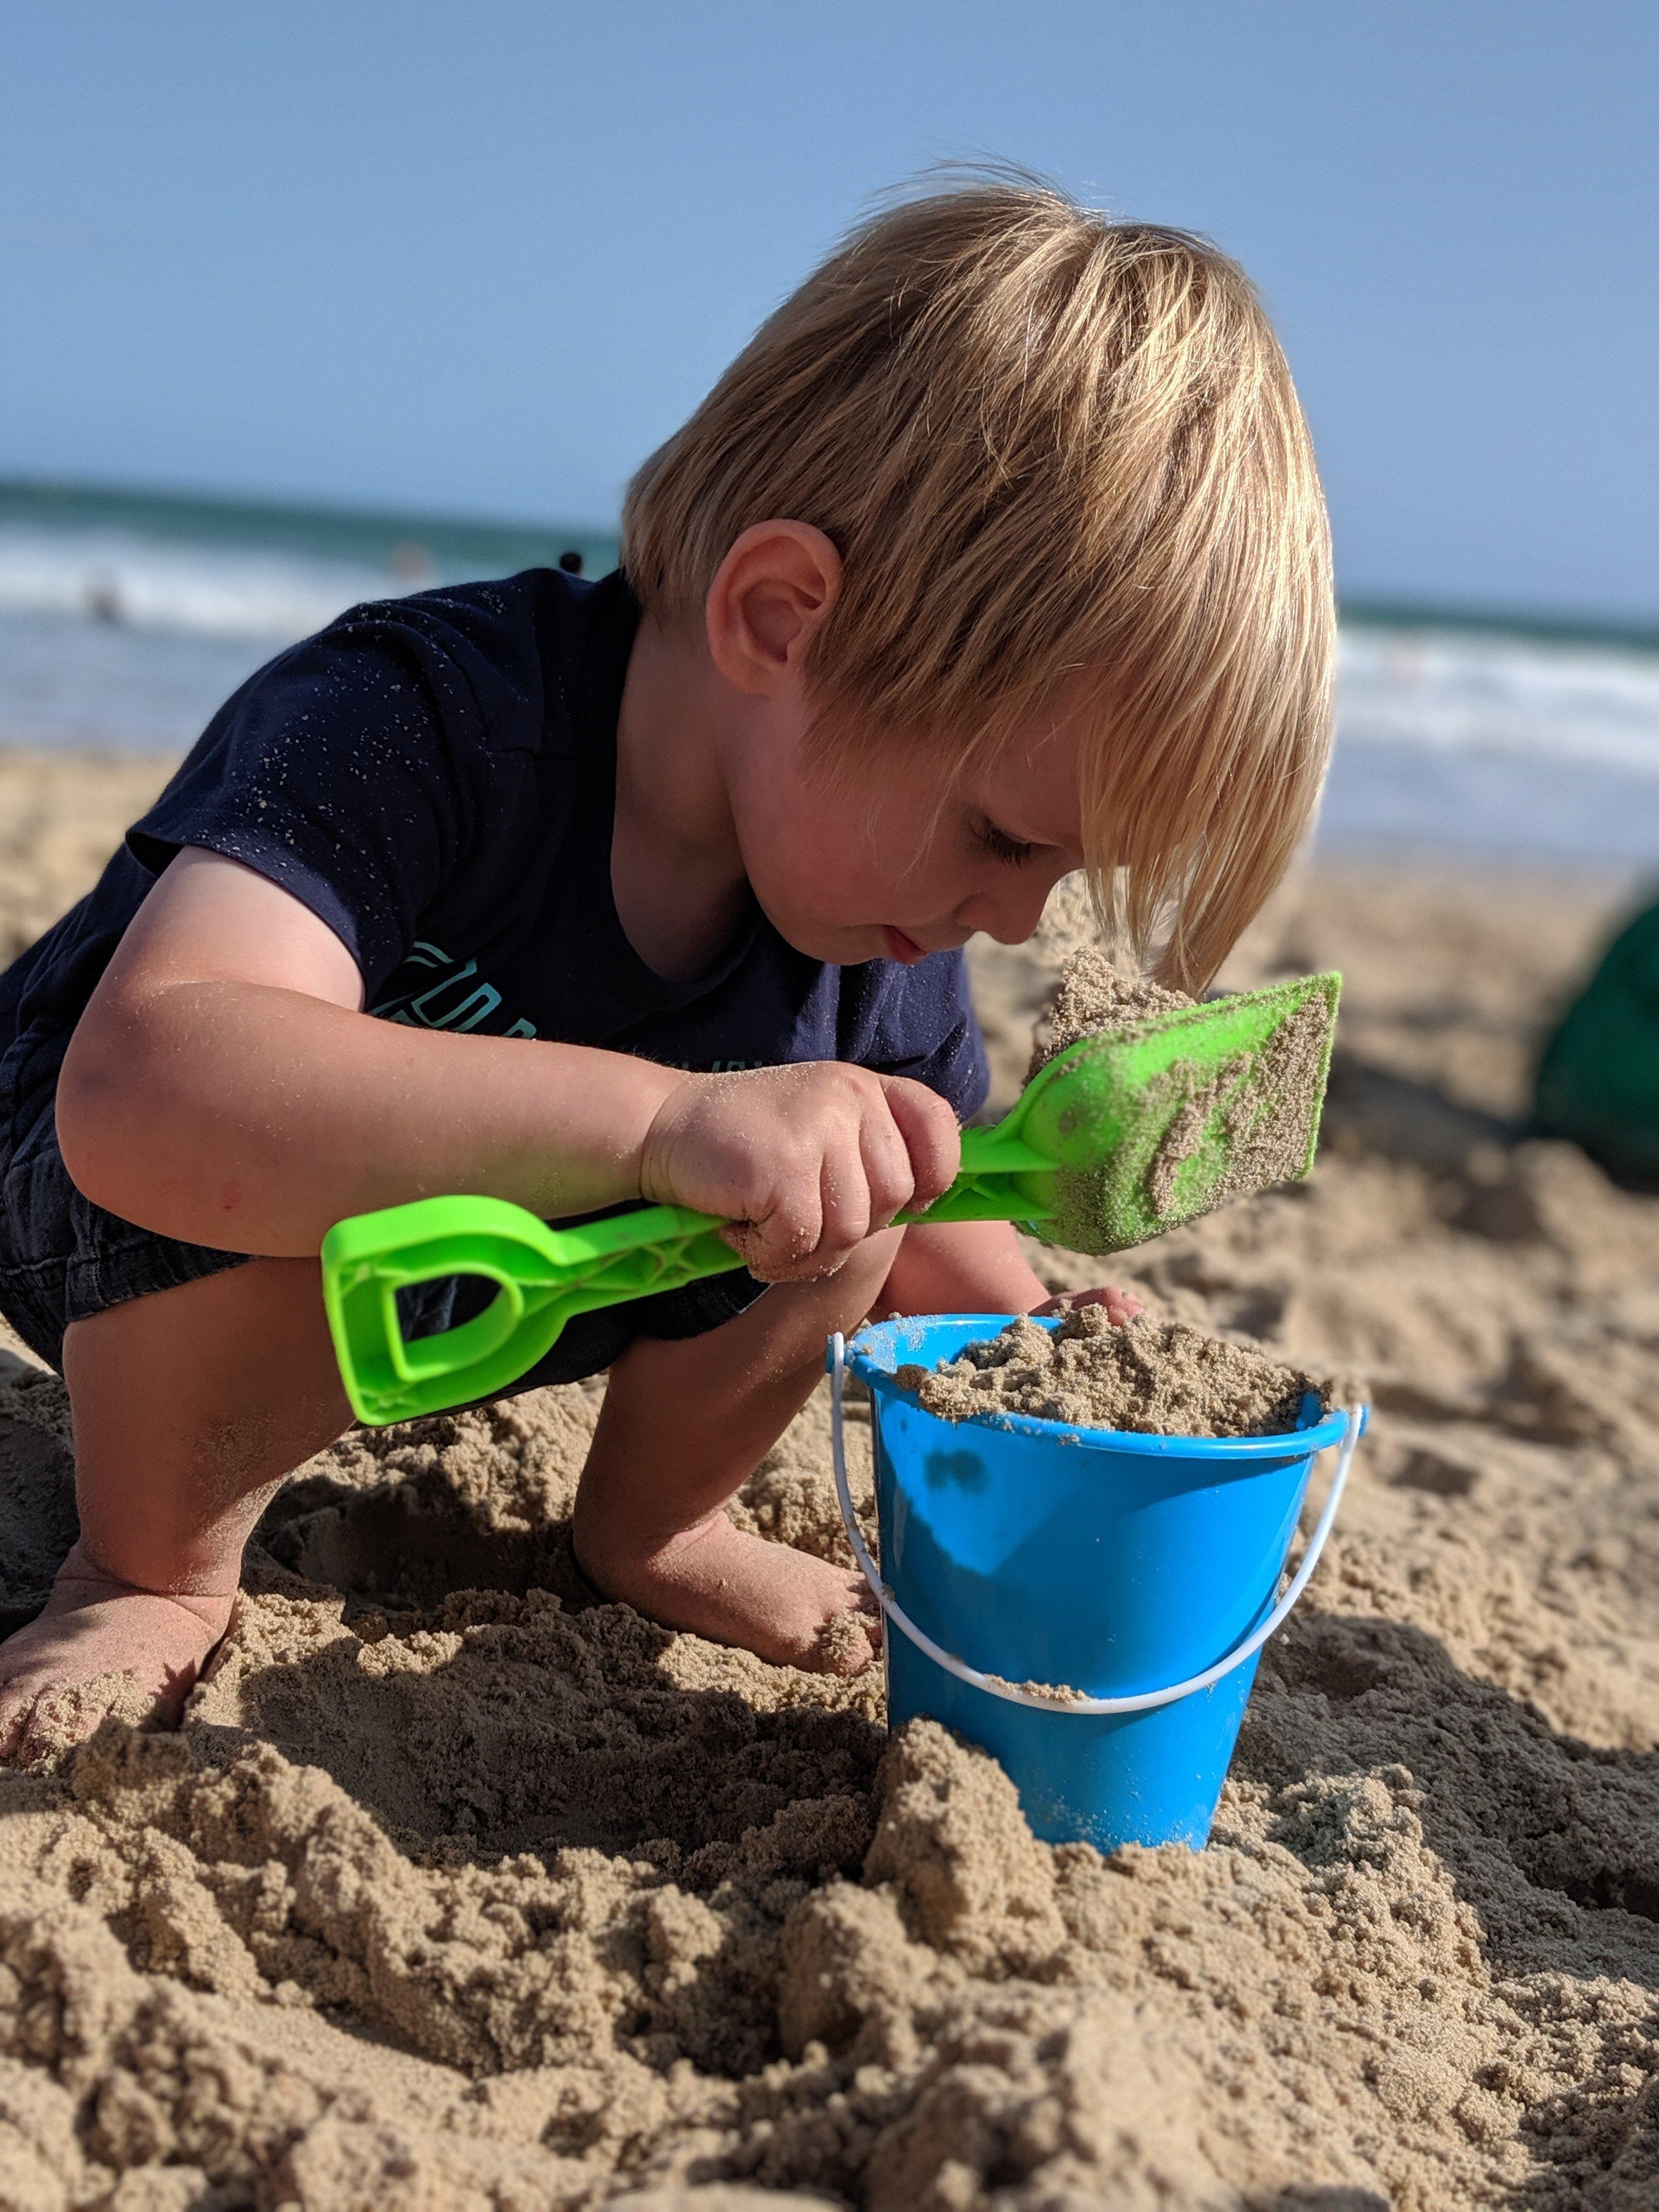 toddler on the beach making sandcastles